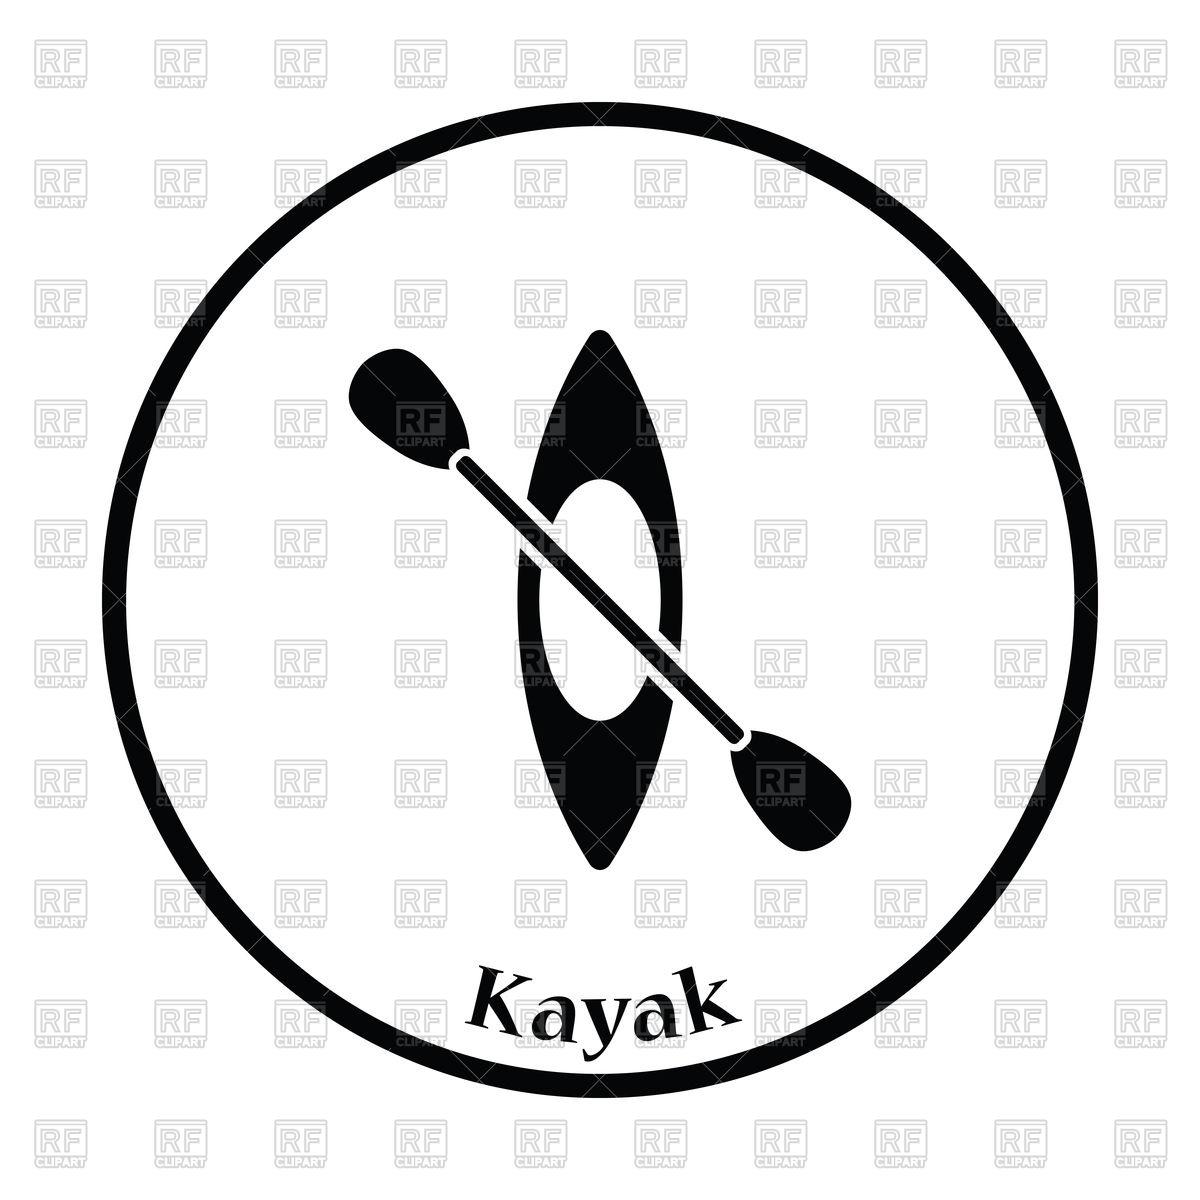 1200x1200 Thin Circle Design Of Kayak And Paddle Icon Royalty Free Vector